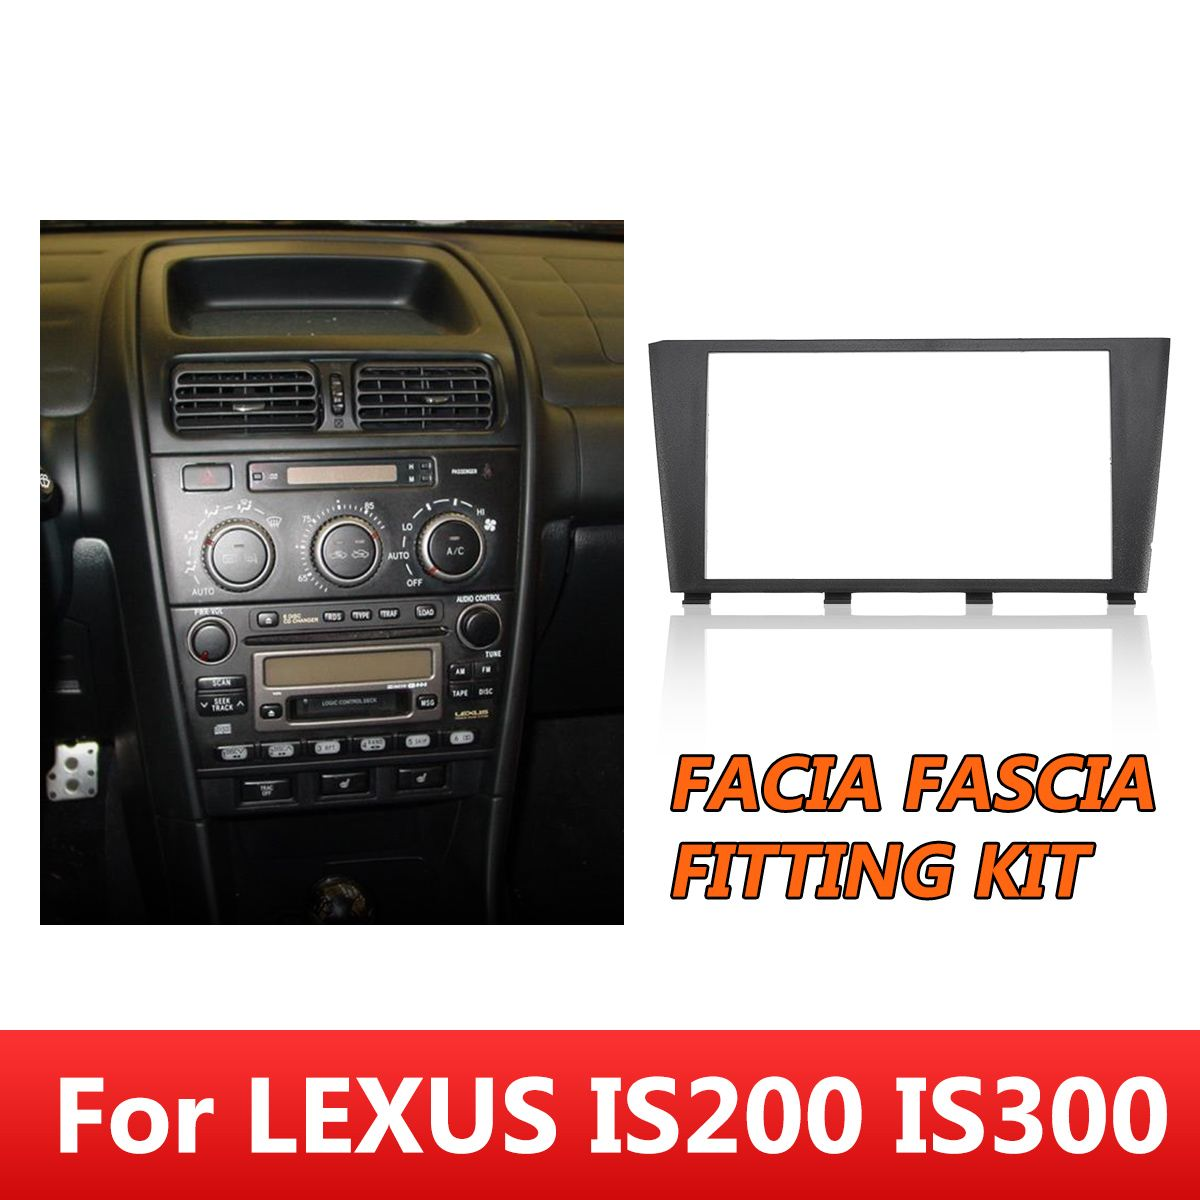 2003 Car Stereo Radio Fascia Facia Panel /& ISO Fitting Kit Ford Mondeo 1996